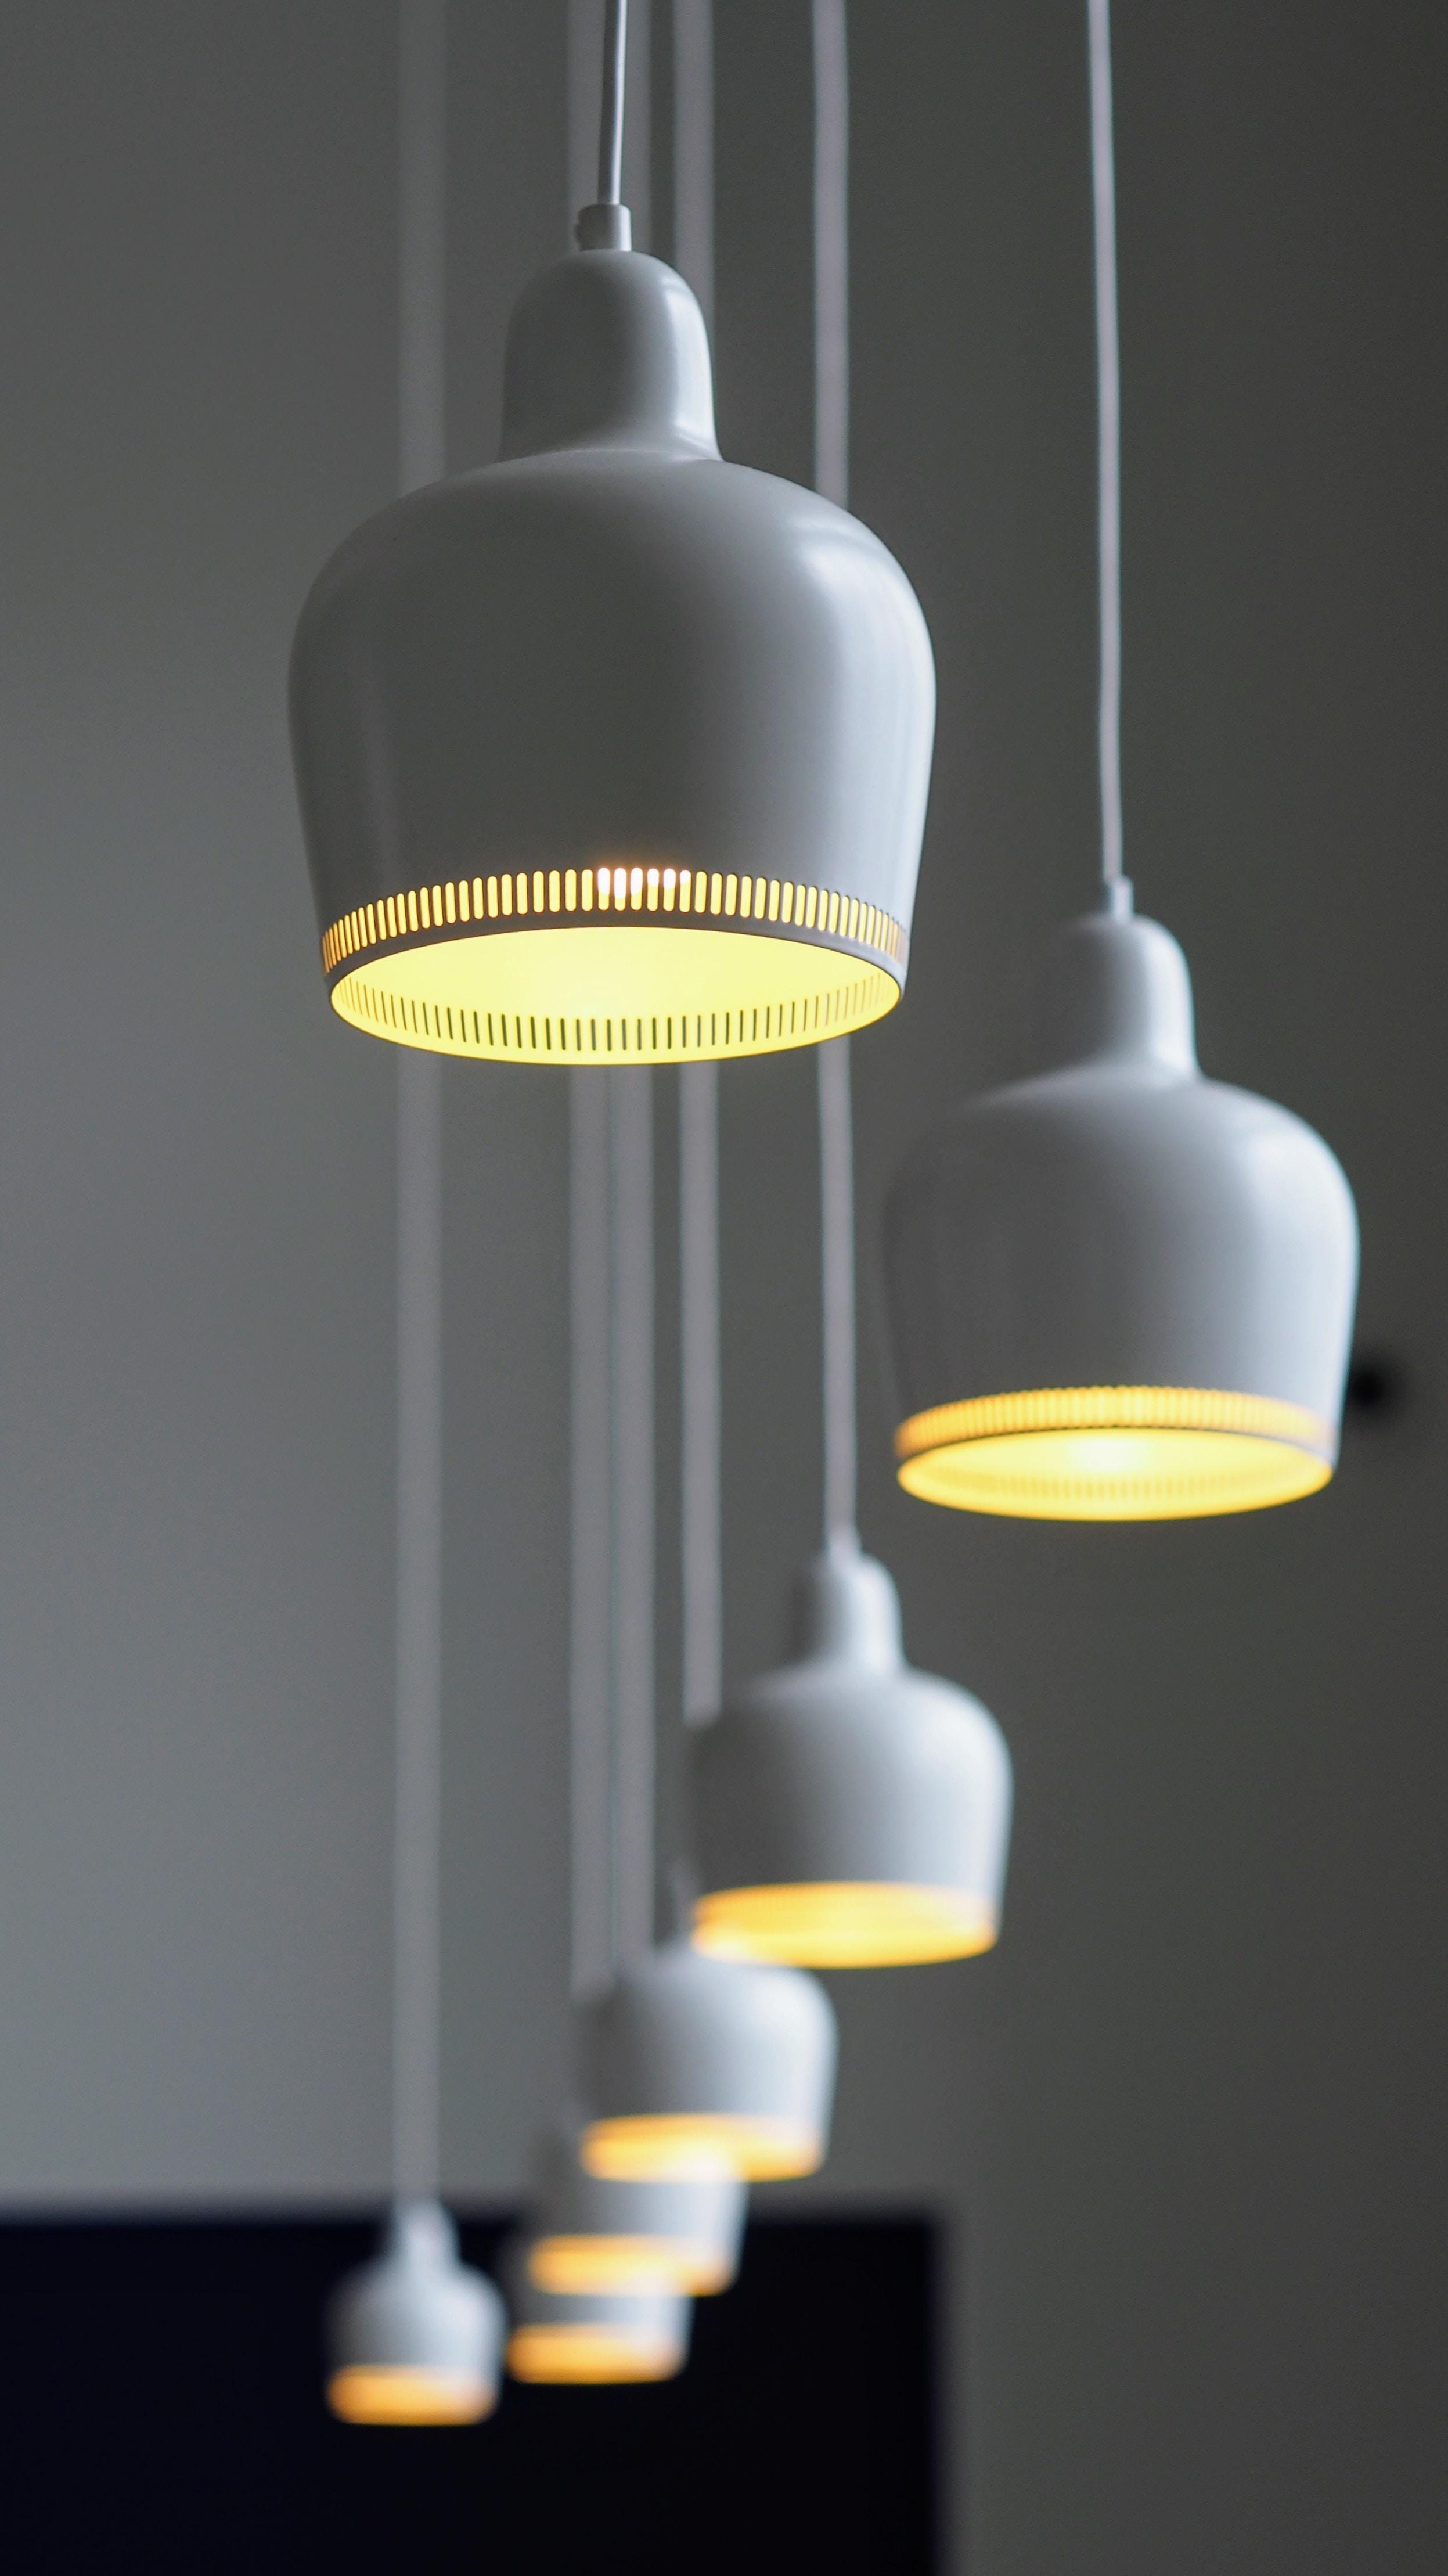 Commercial lighting updates